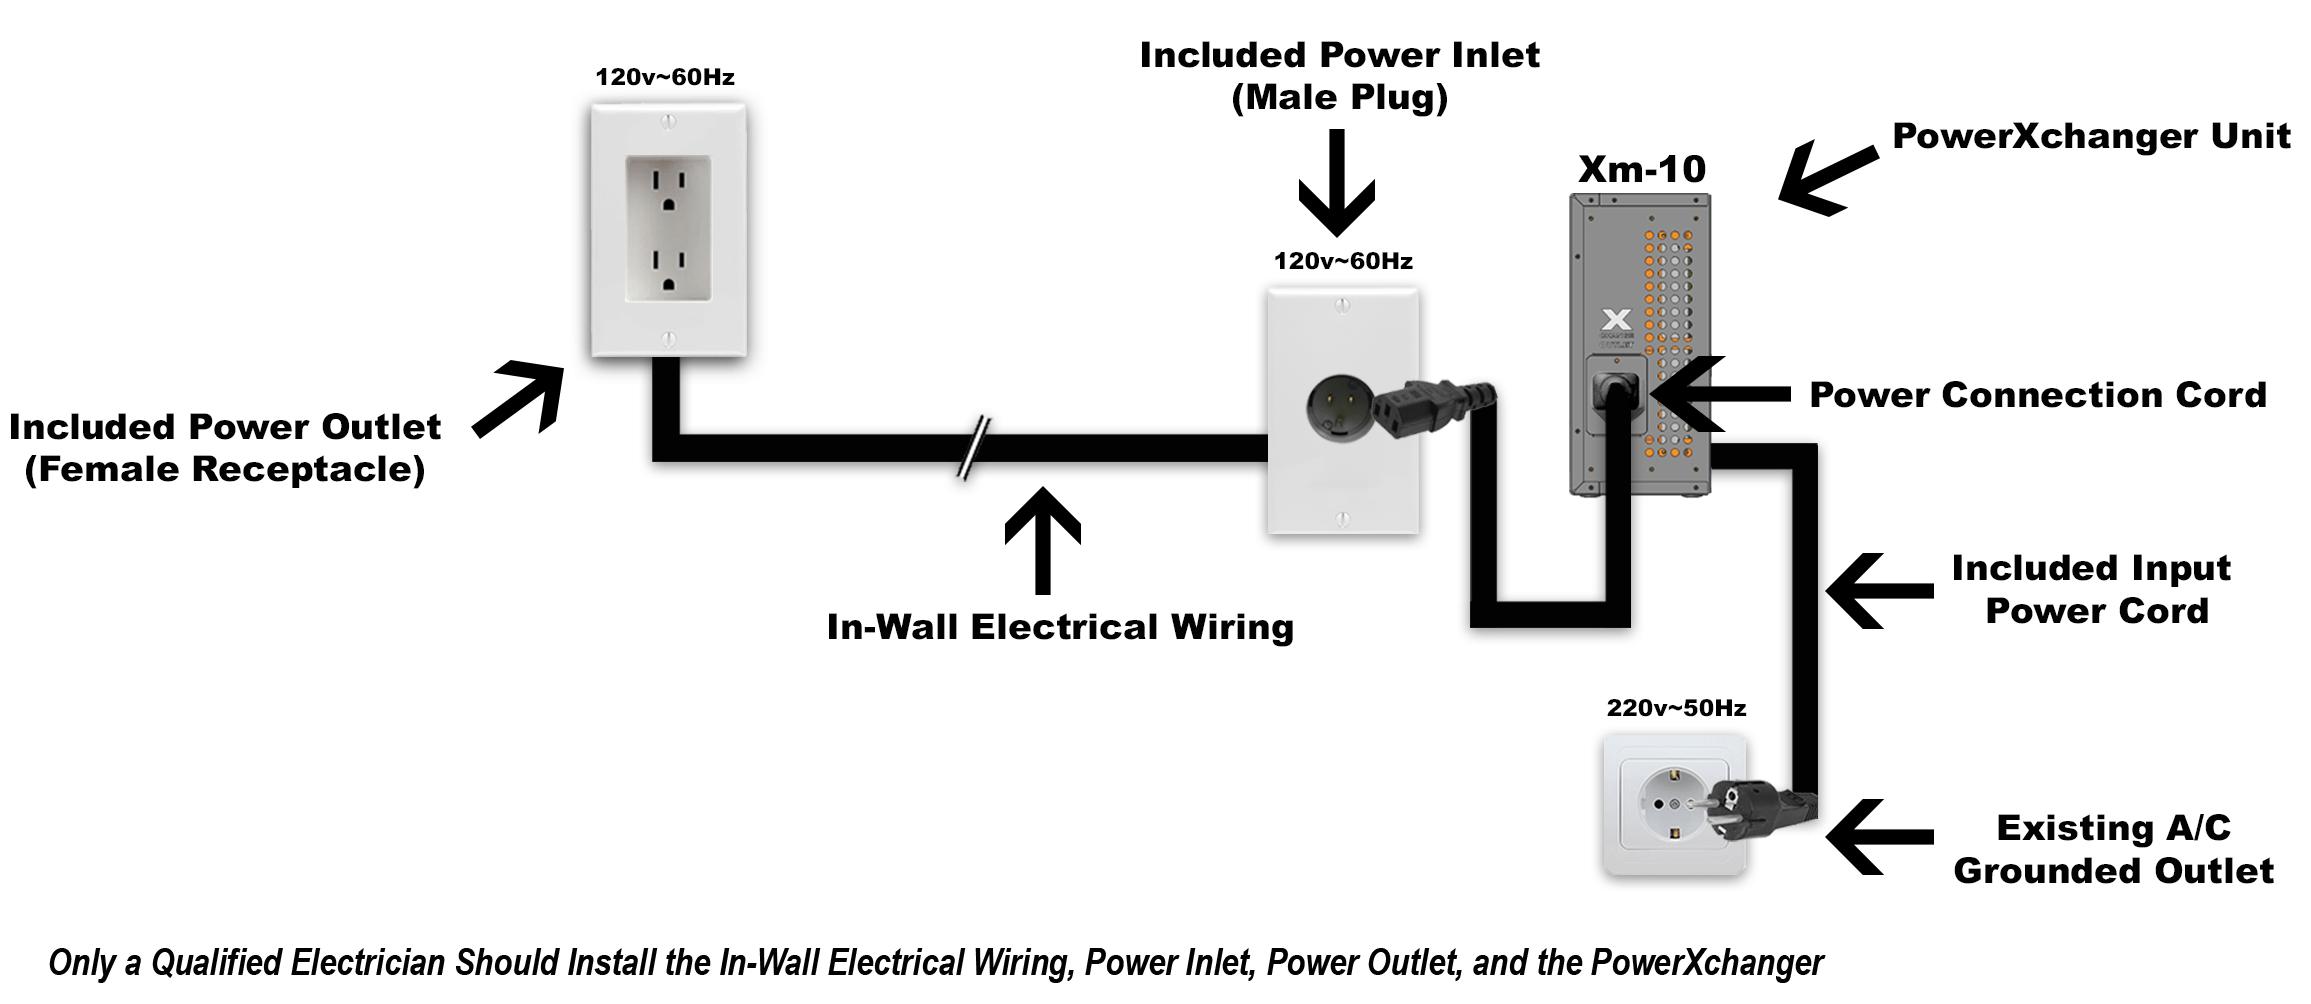 Installer Series Xm-10